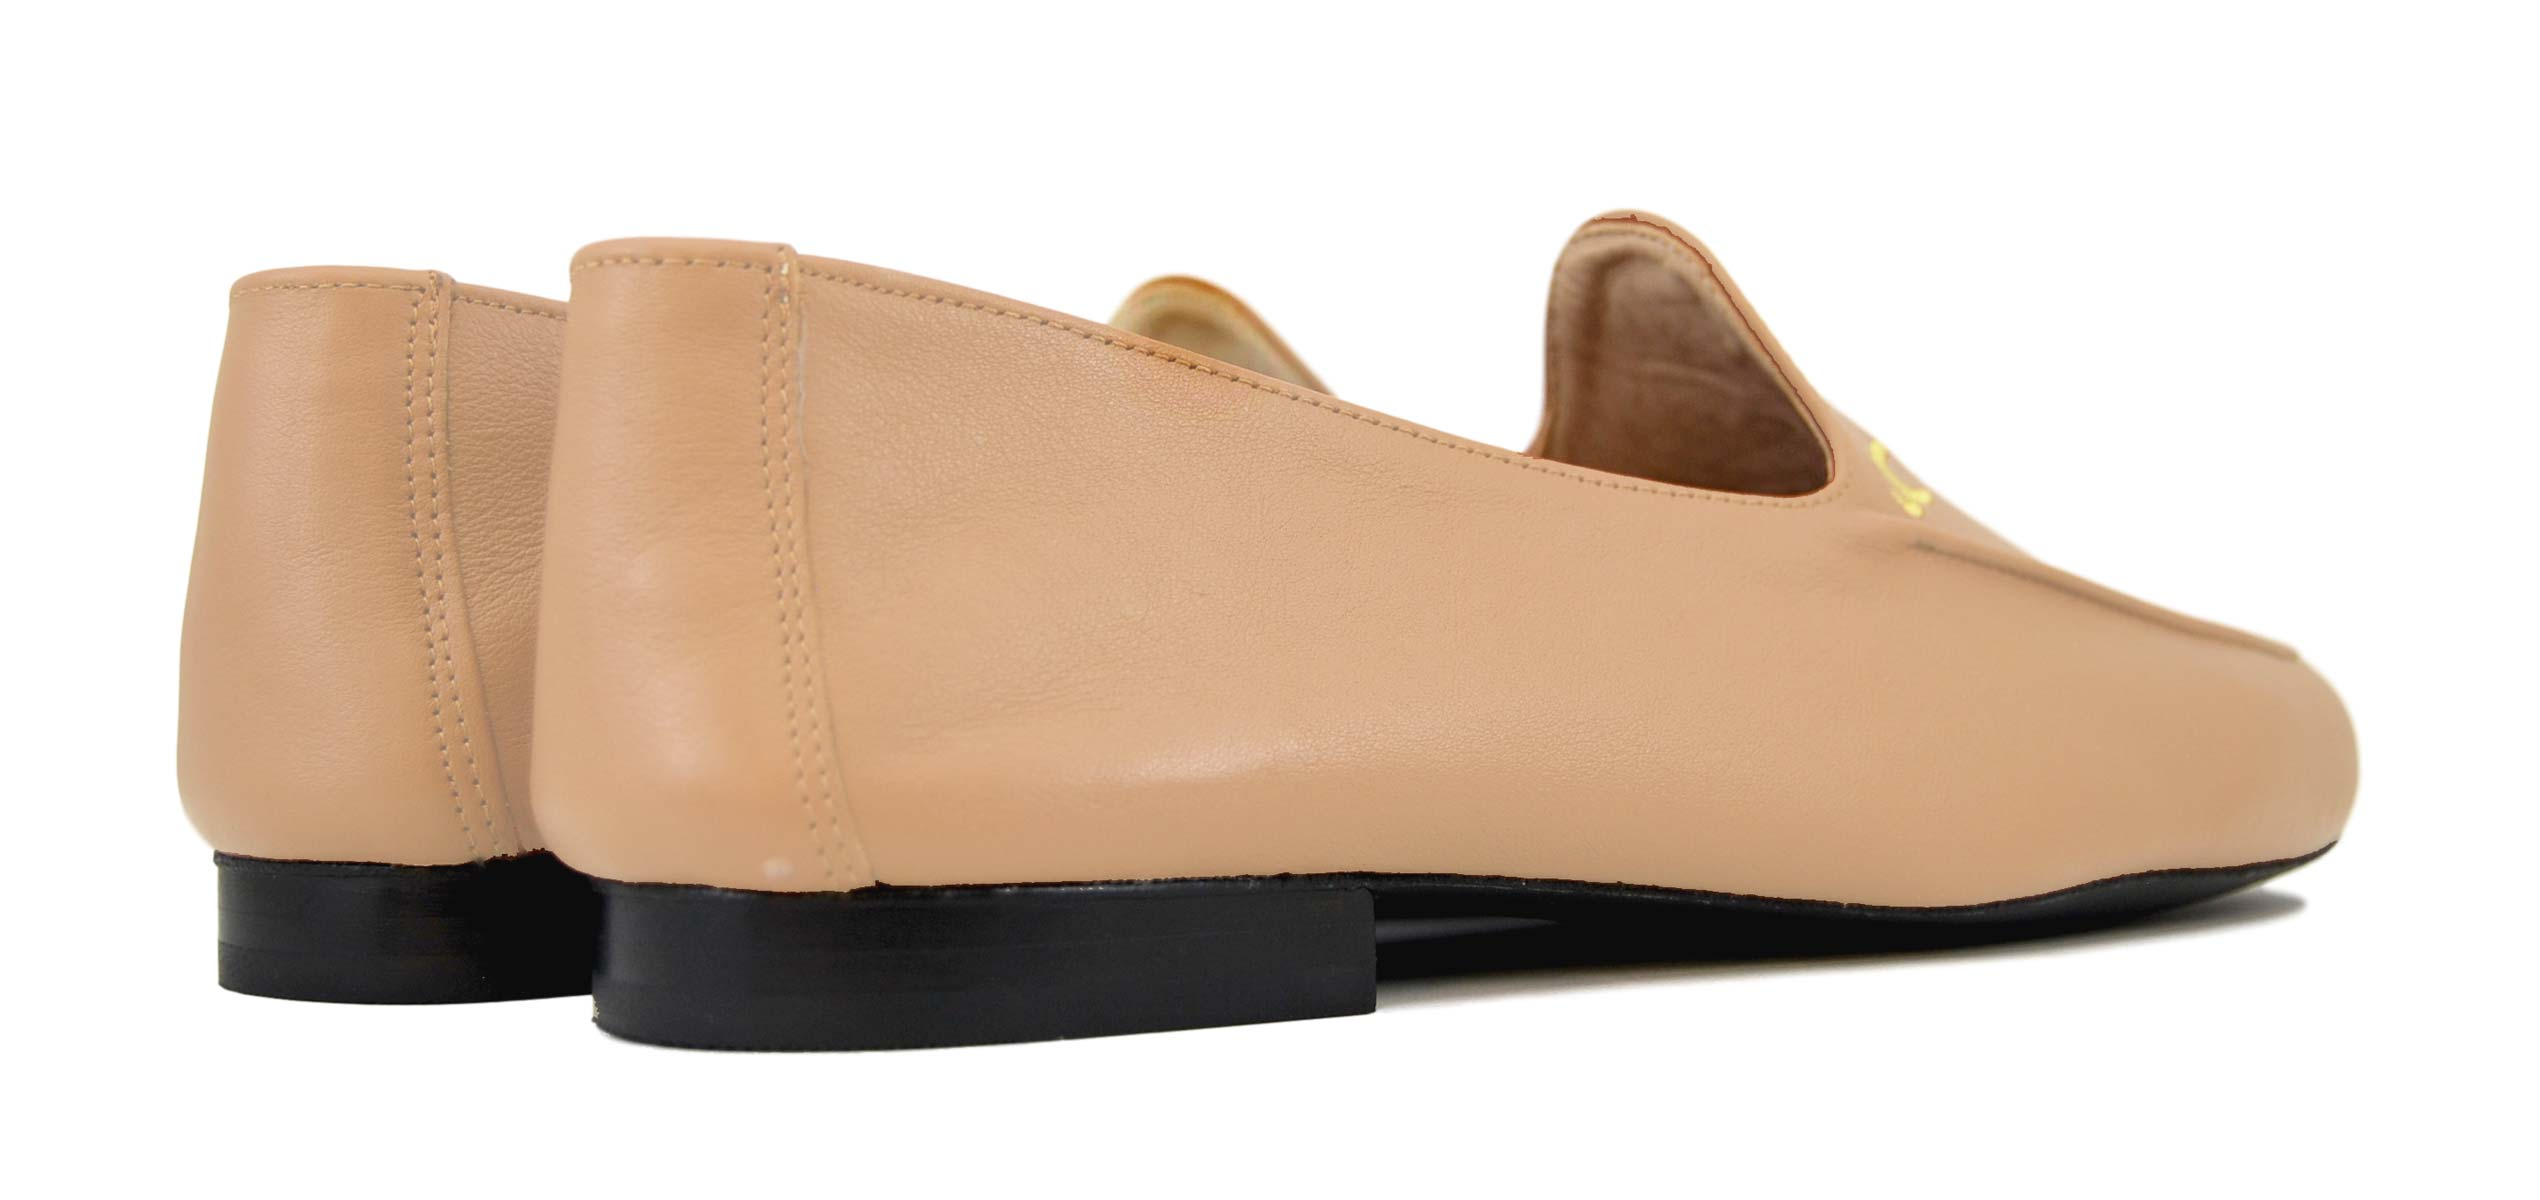 Foto 4 de Zapatos Julio Iglesias 528 JC Pink Napa Piel Original